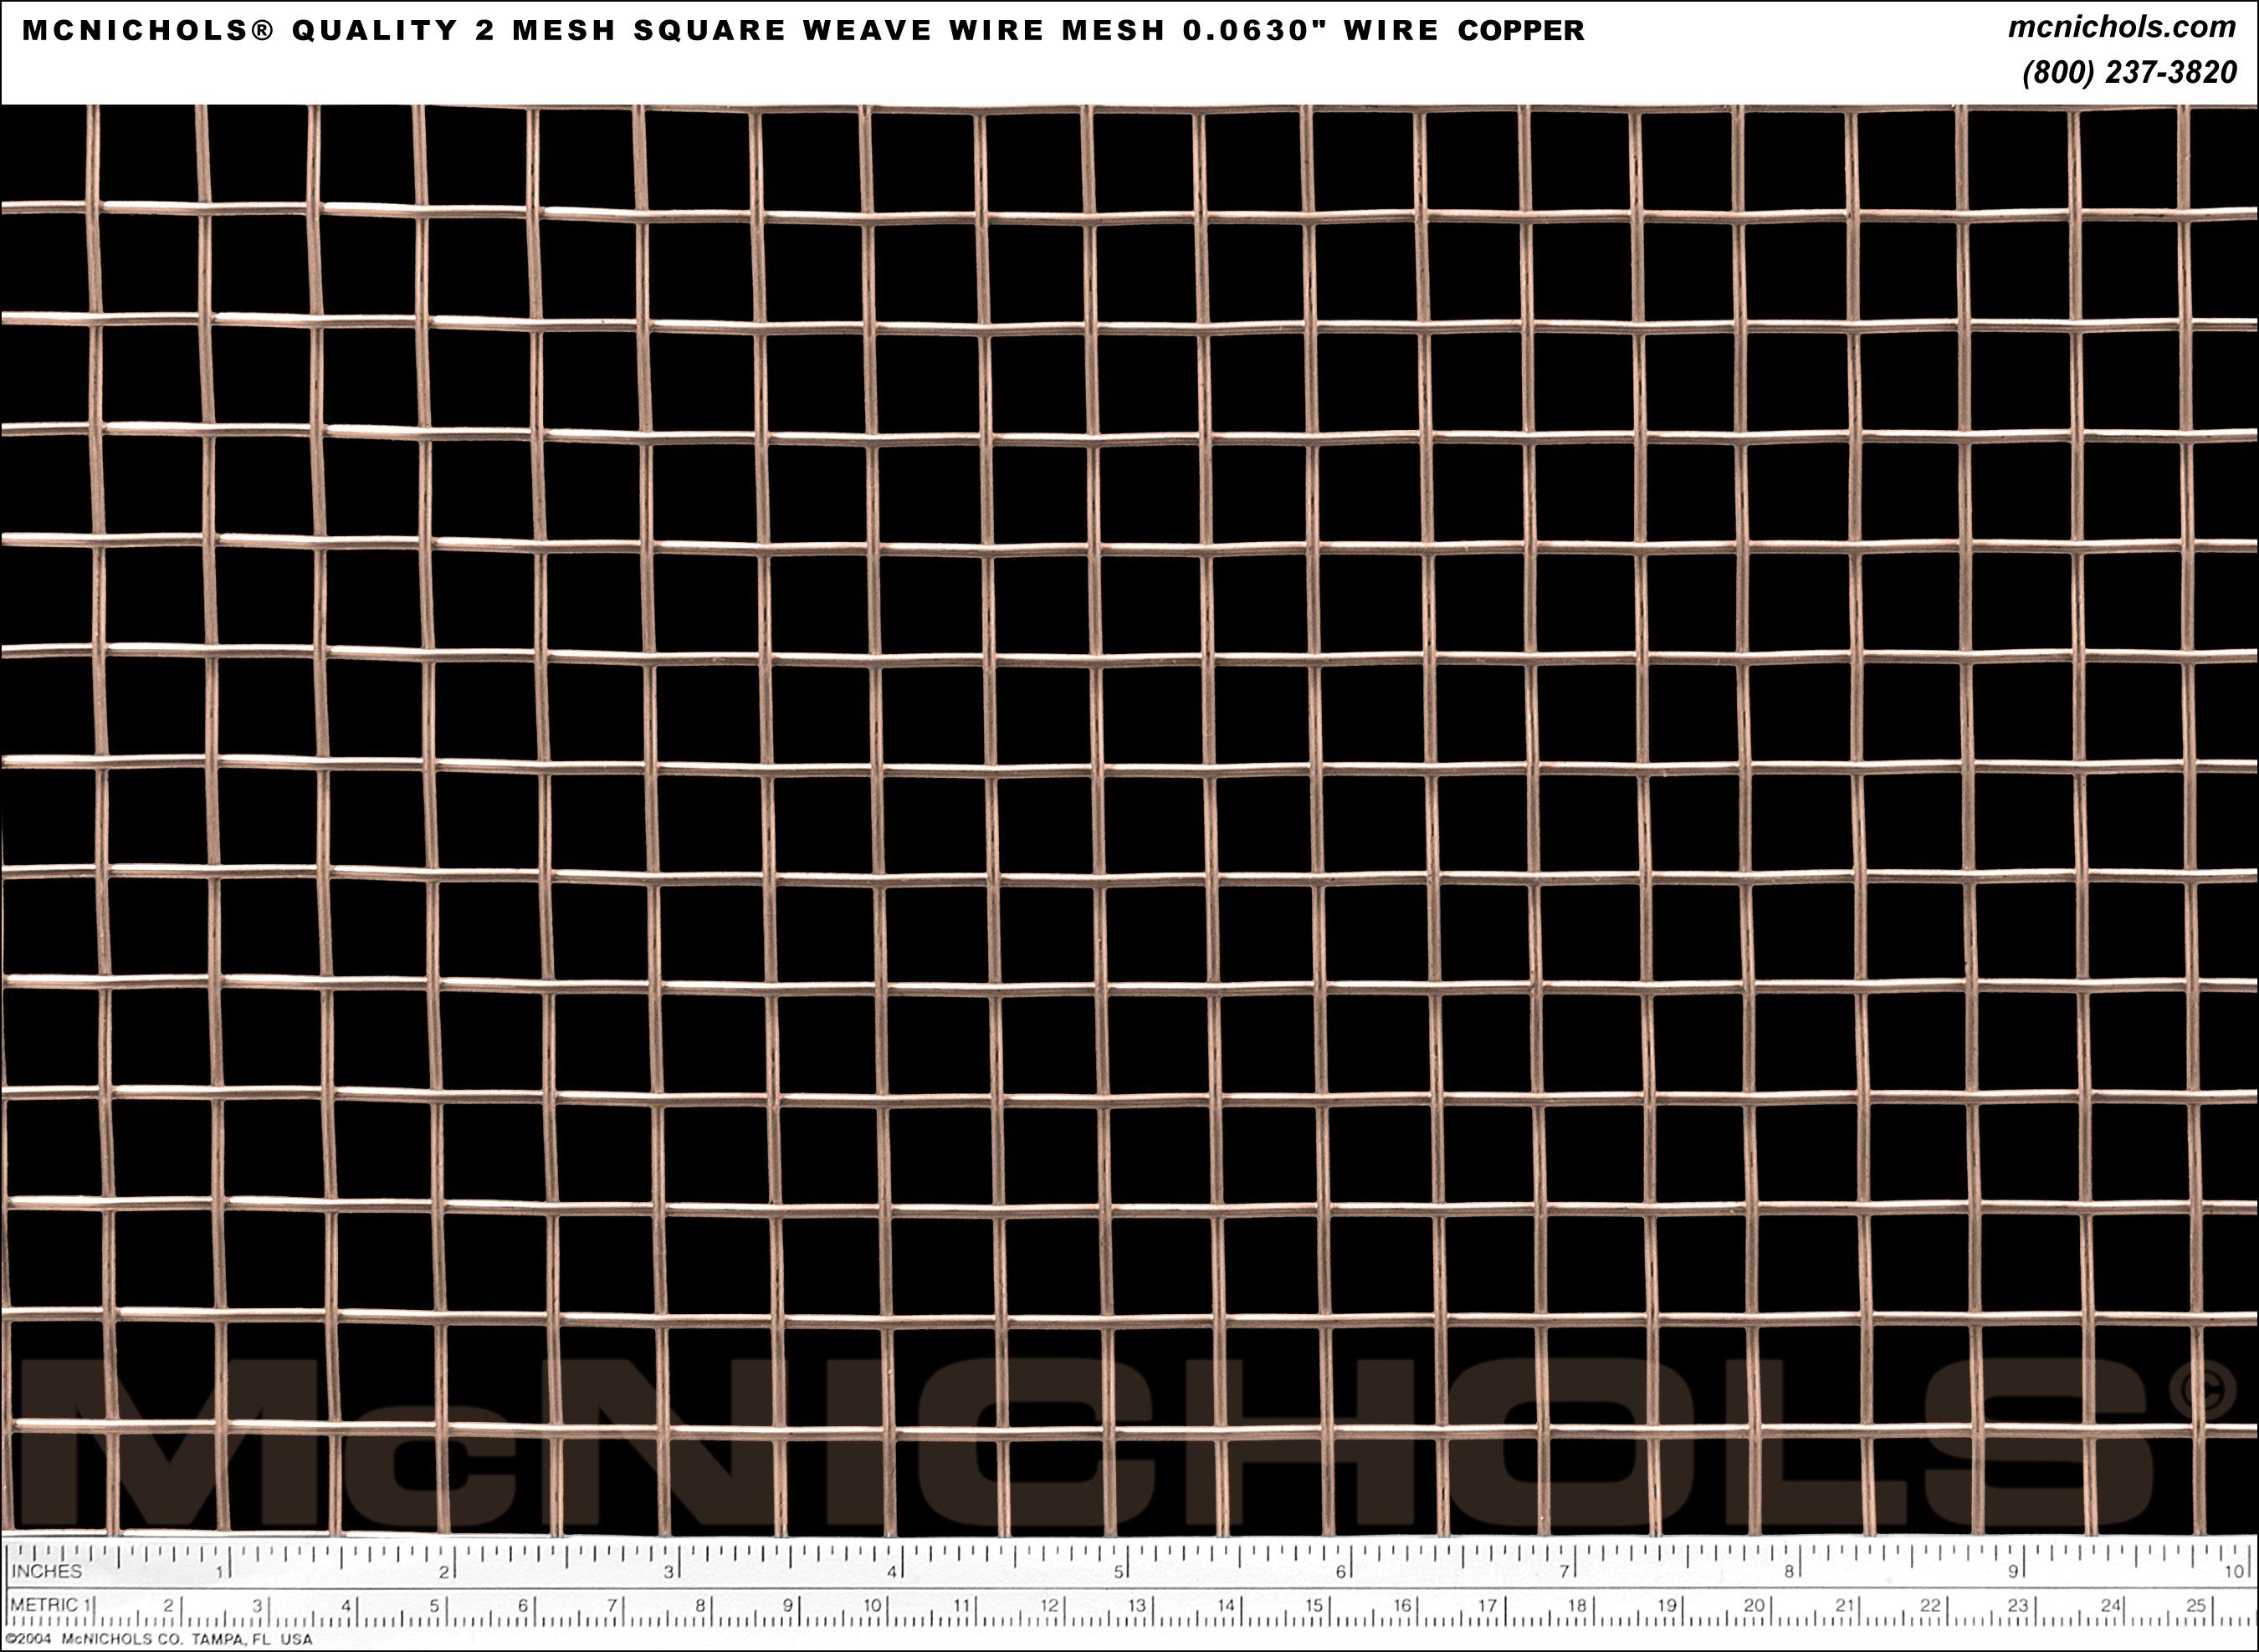 Mcnichols Square Weave Wire Mesh Center Ssl3250a Photo Flash Led Driver Quality 2 0 0630 Copper Rh Pinterest Com